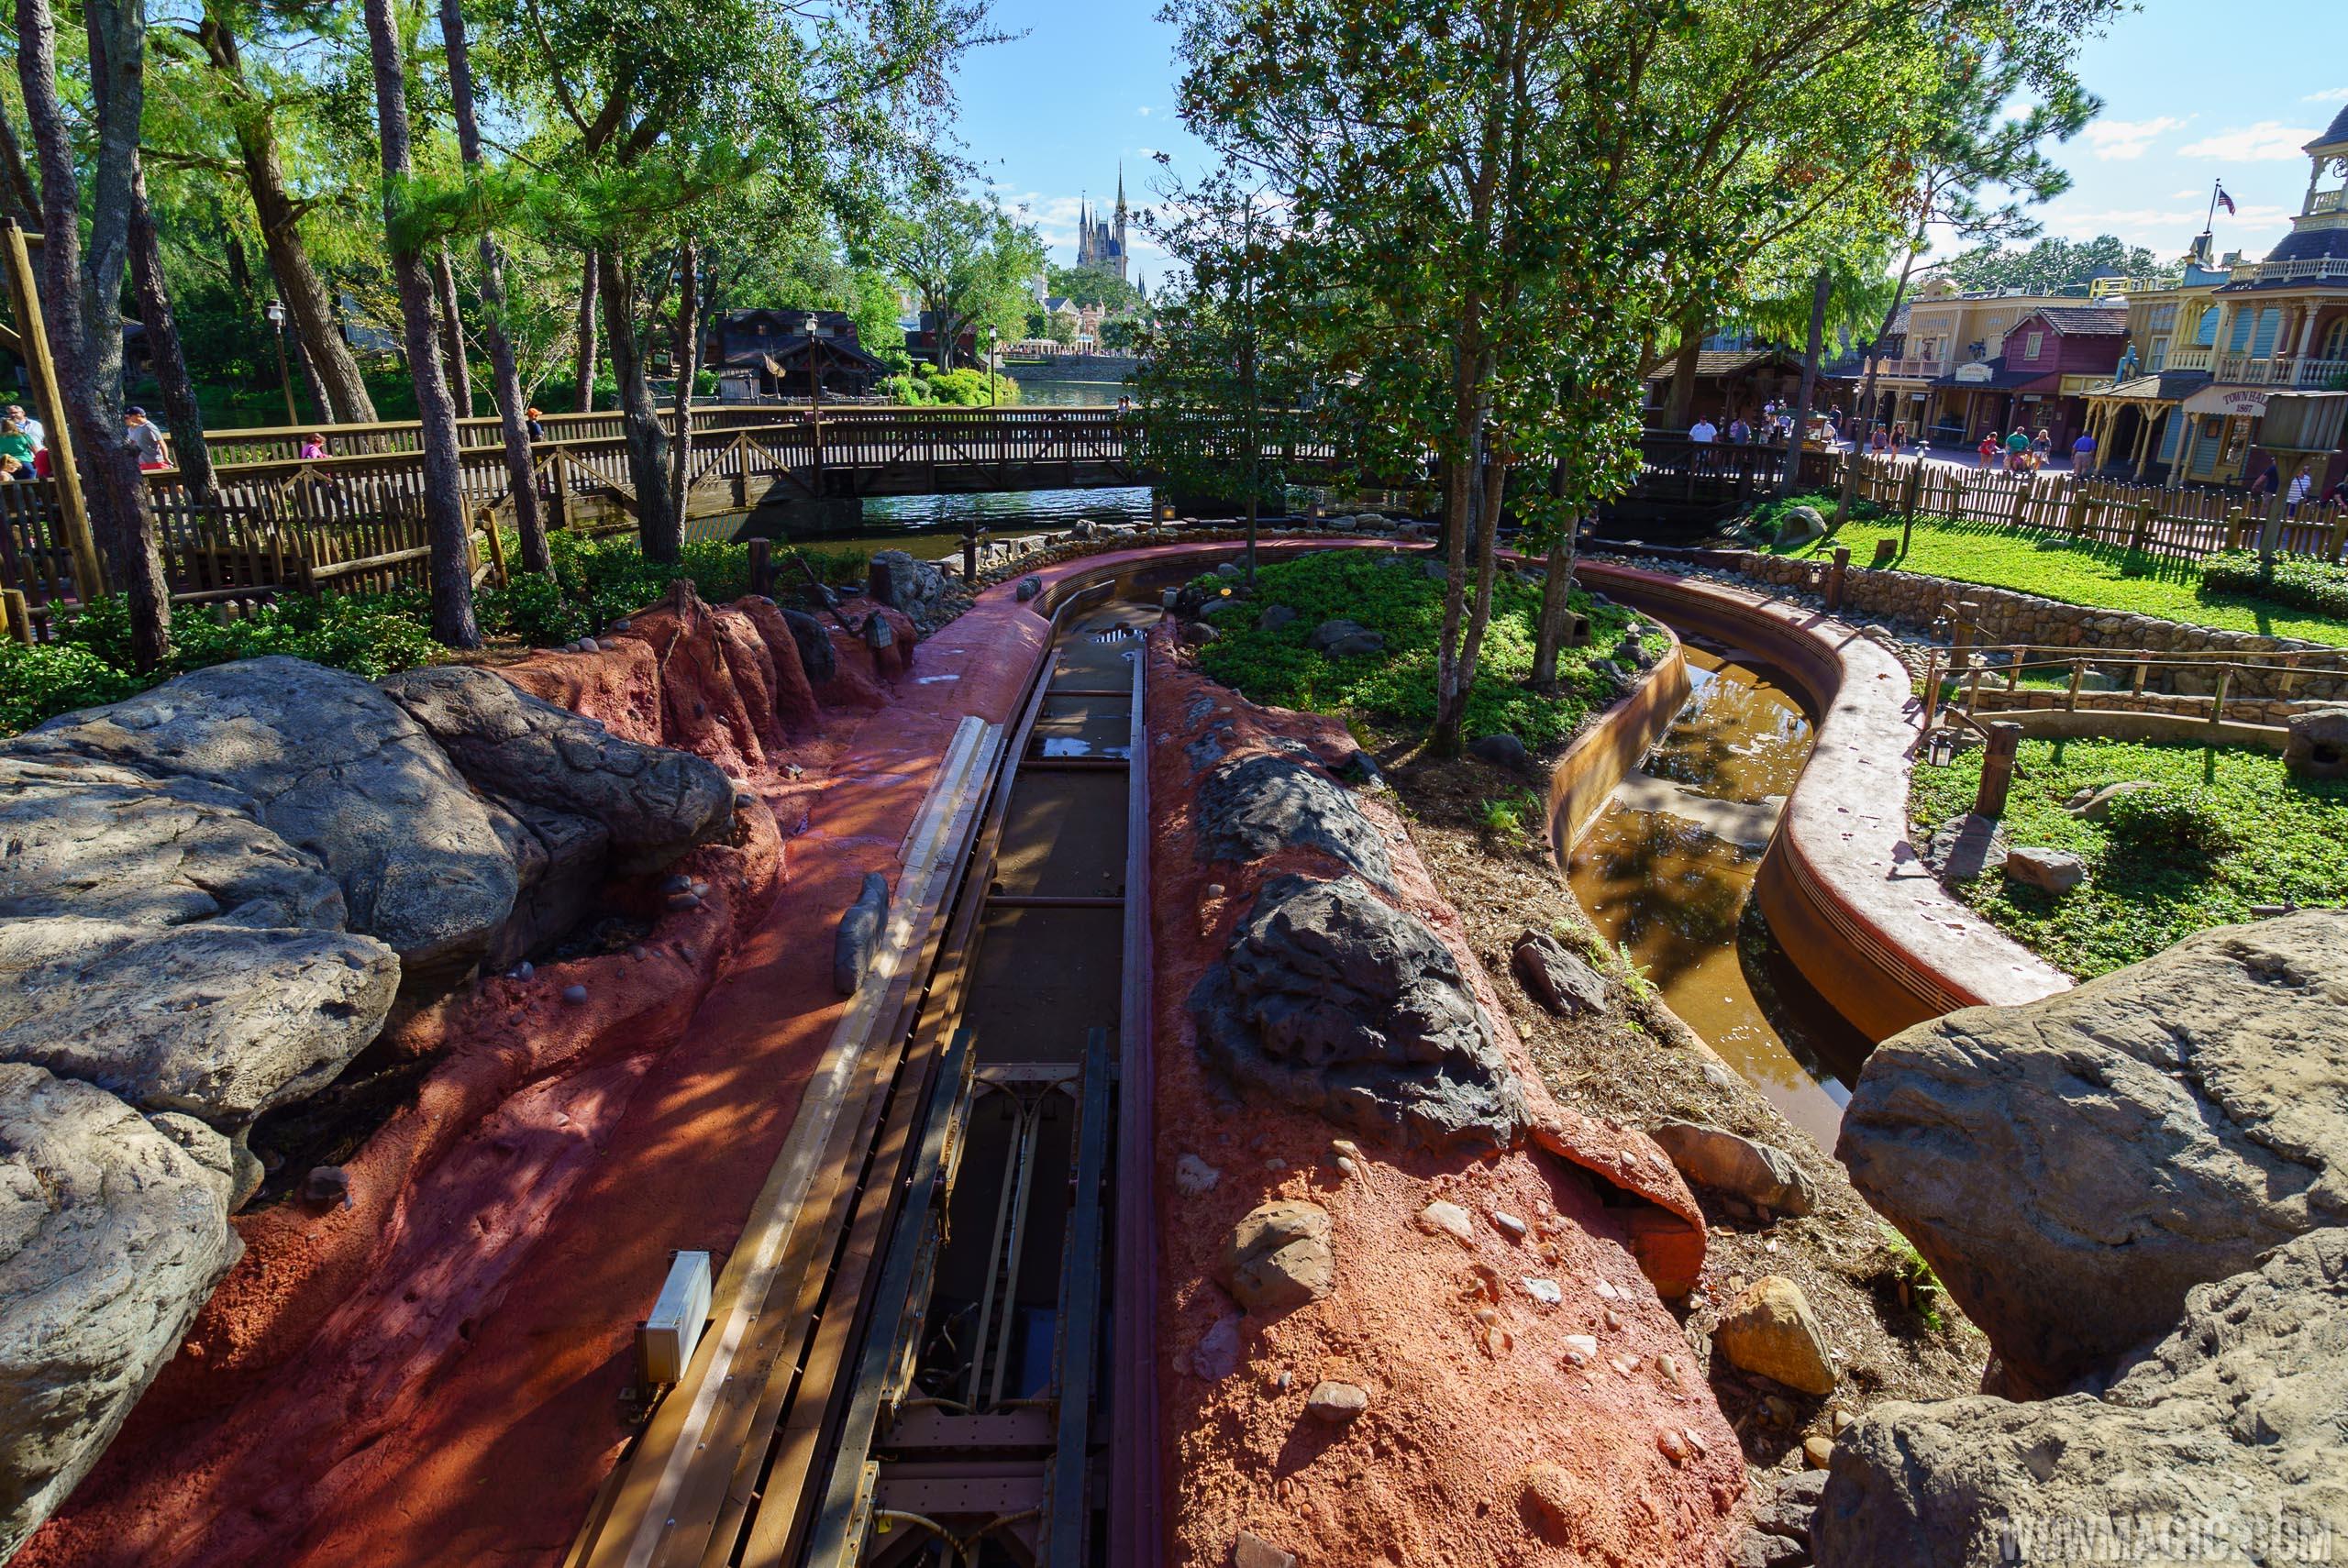 Splash Mountain nearing end of 2017 refurbishment